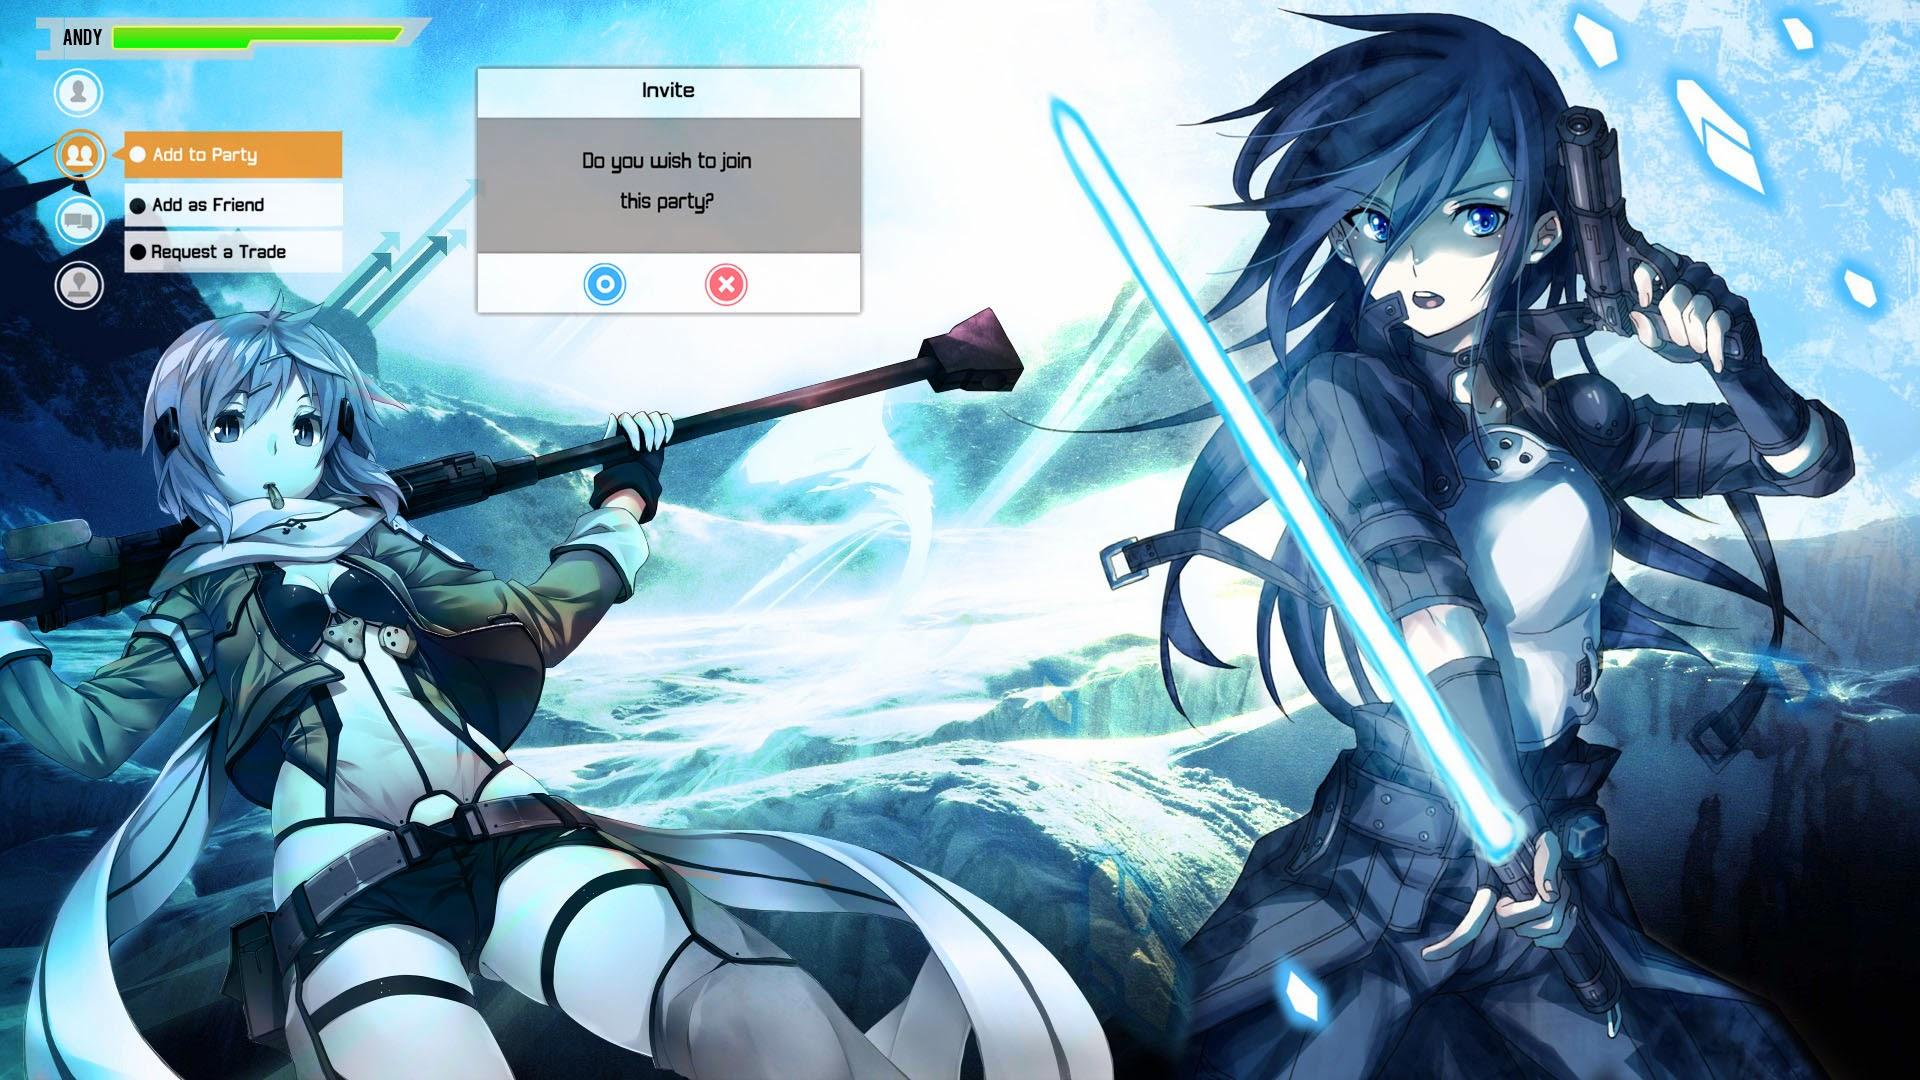 Sword Art Online Wallpaper 1080p Posted By John Walker